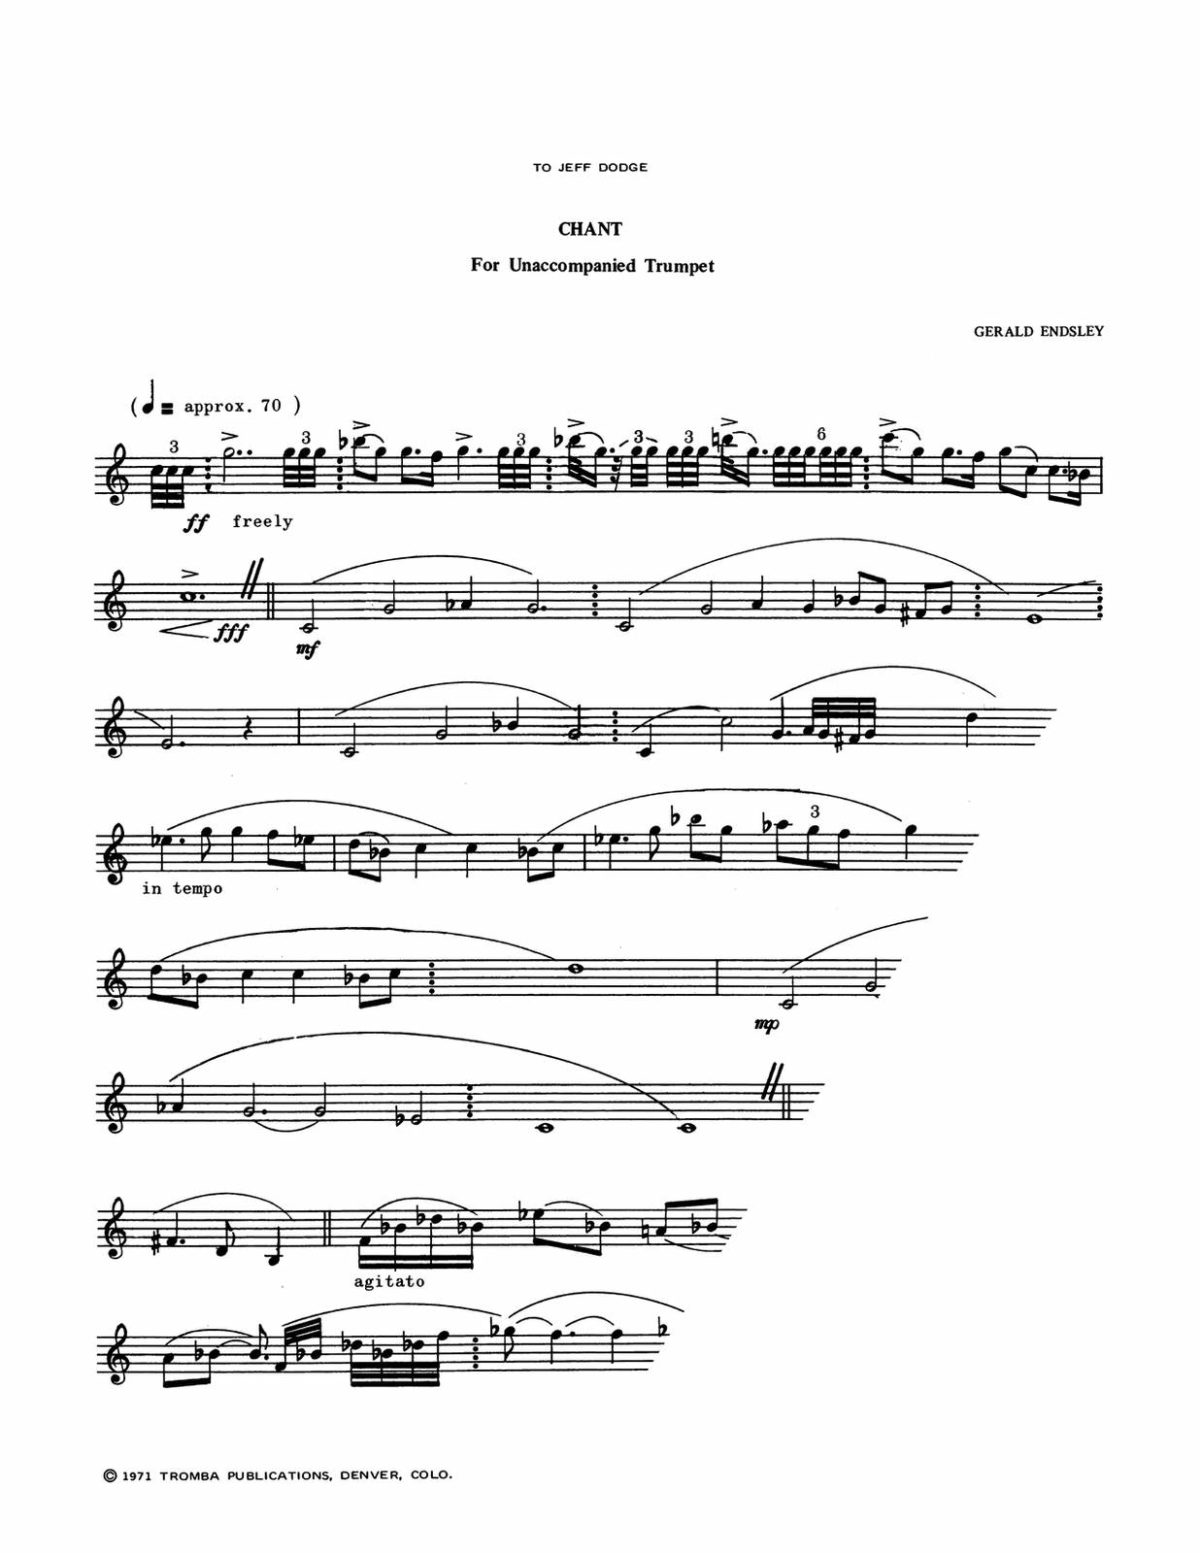 Endsley, Chant for Unaccompanied Trumpet-p2